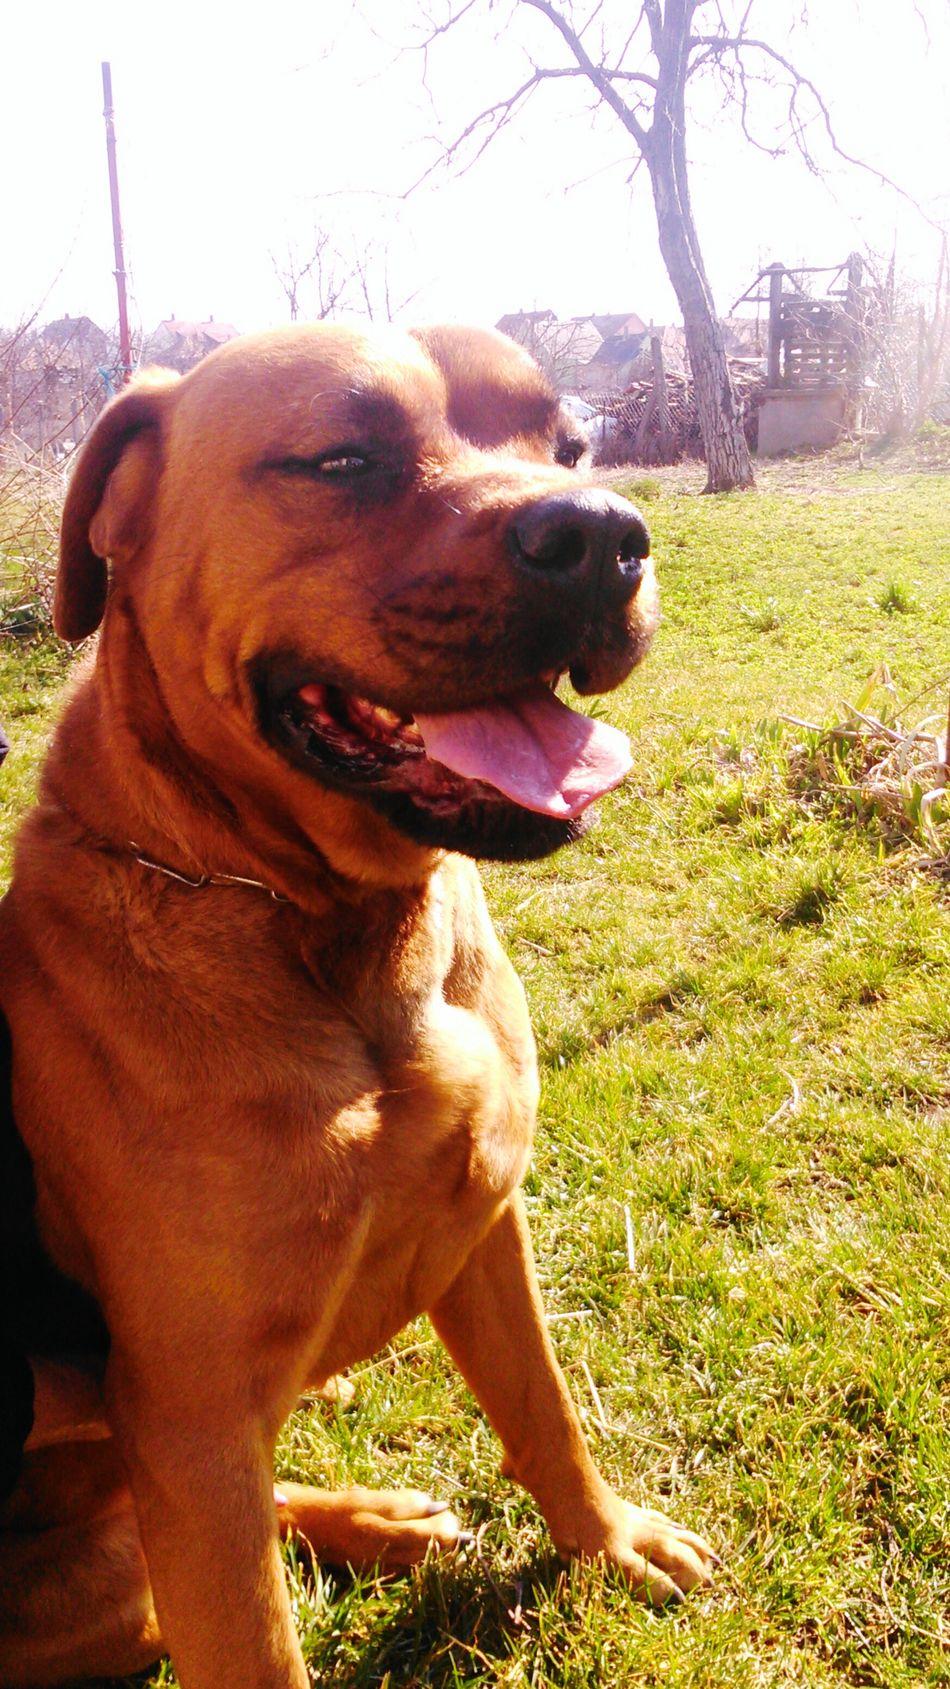 Dog Dog Love Nature Animal